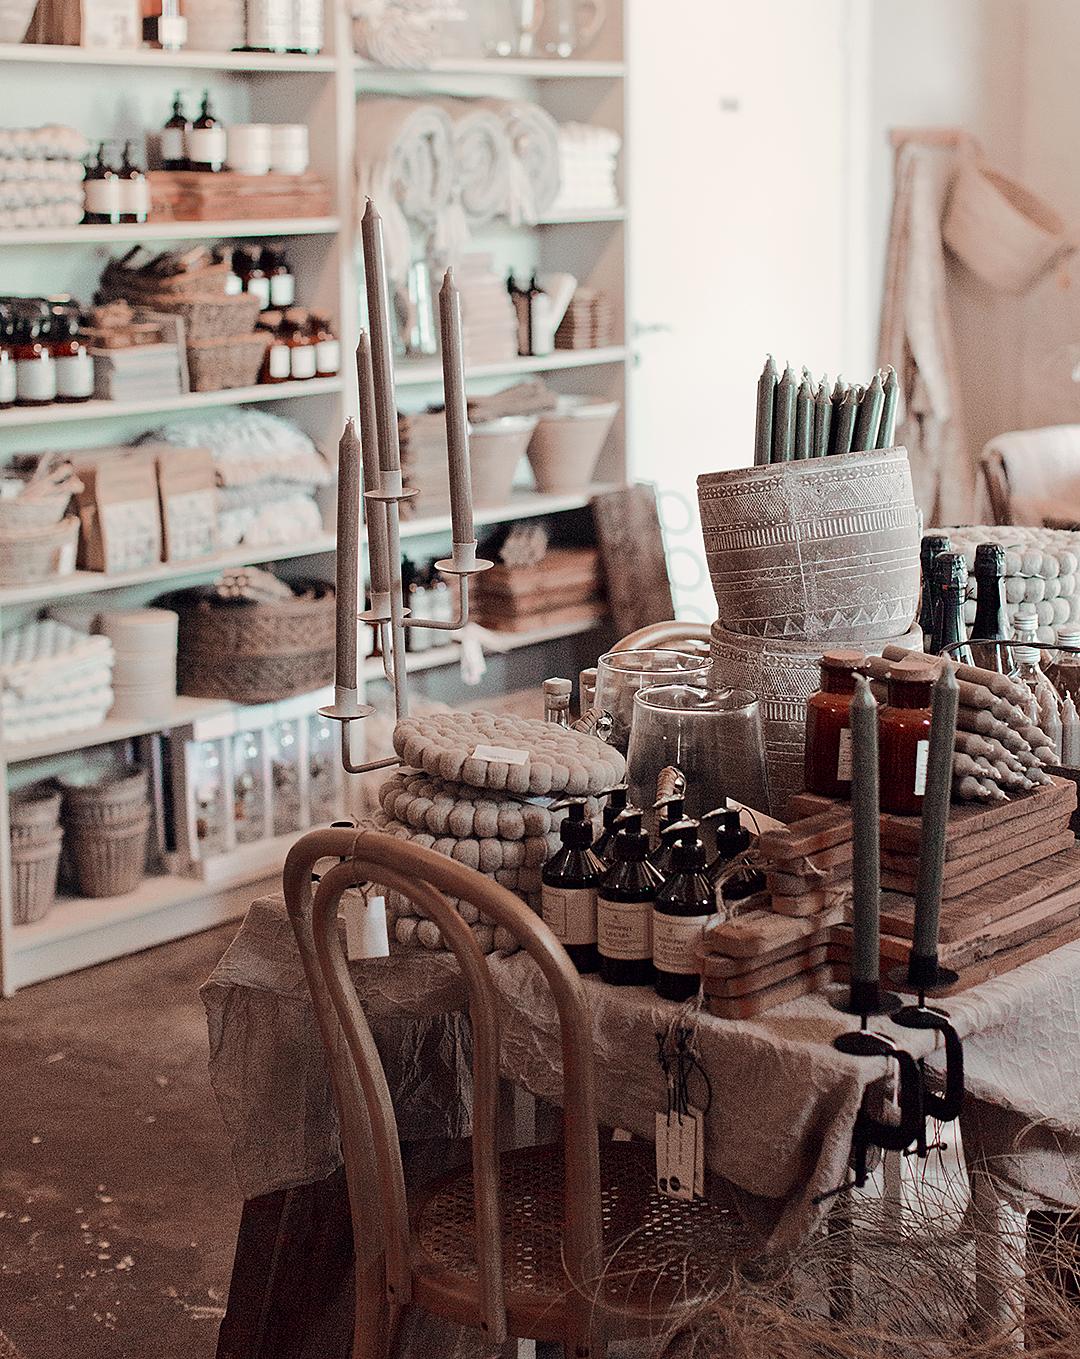 Resedagbok Gotland: Stylemood